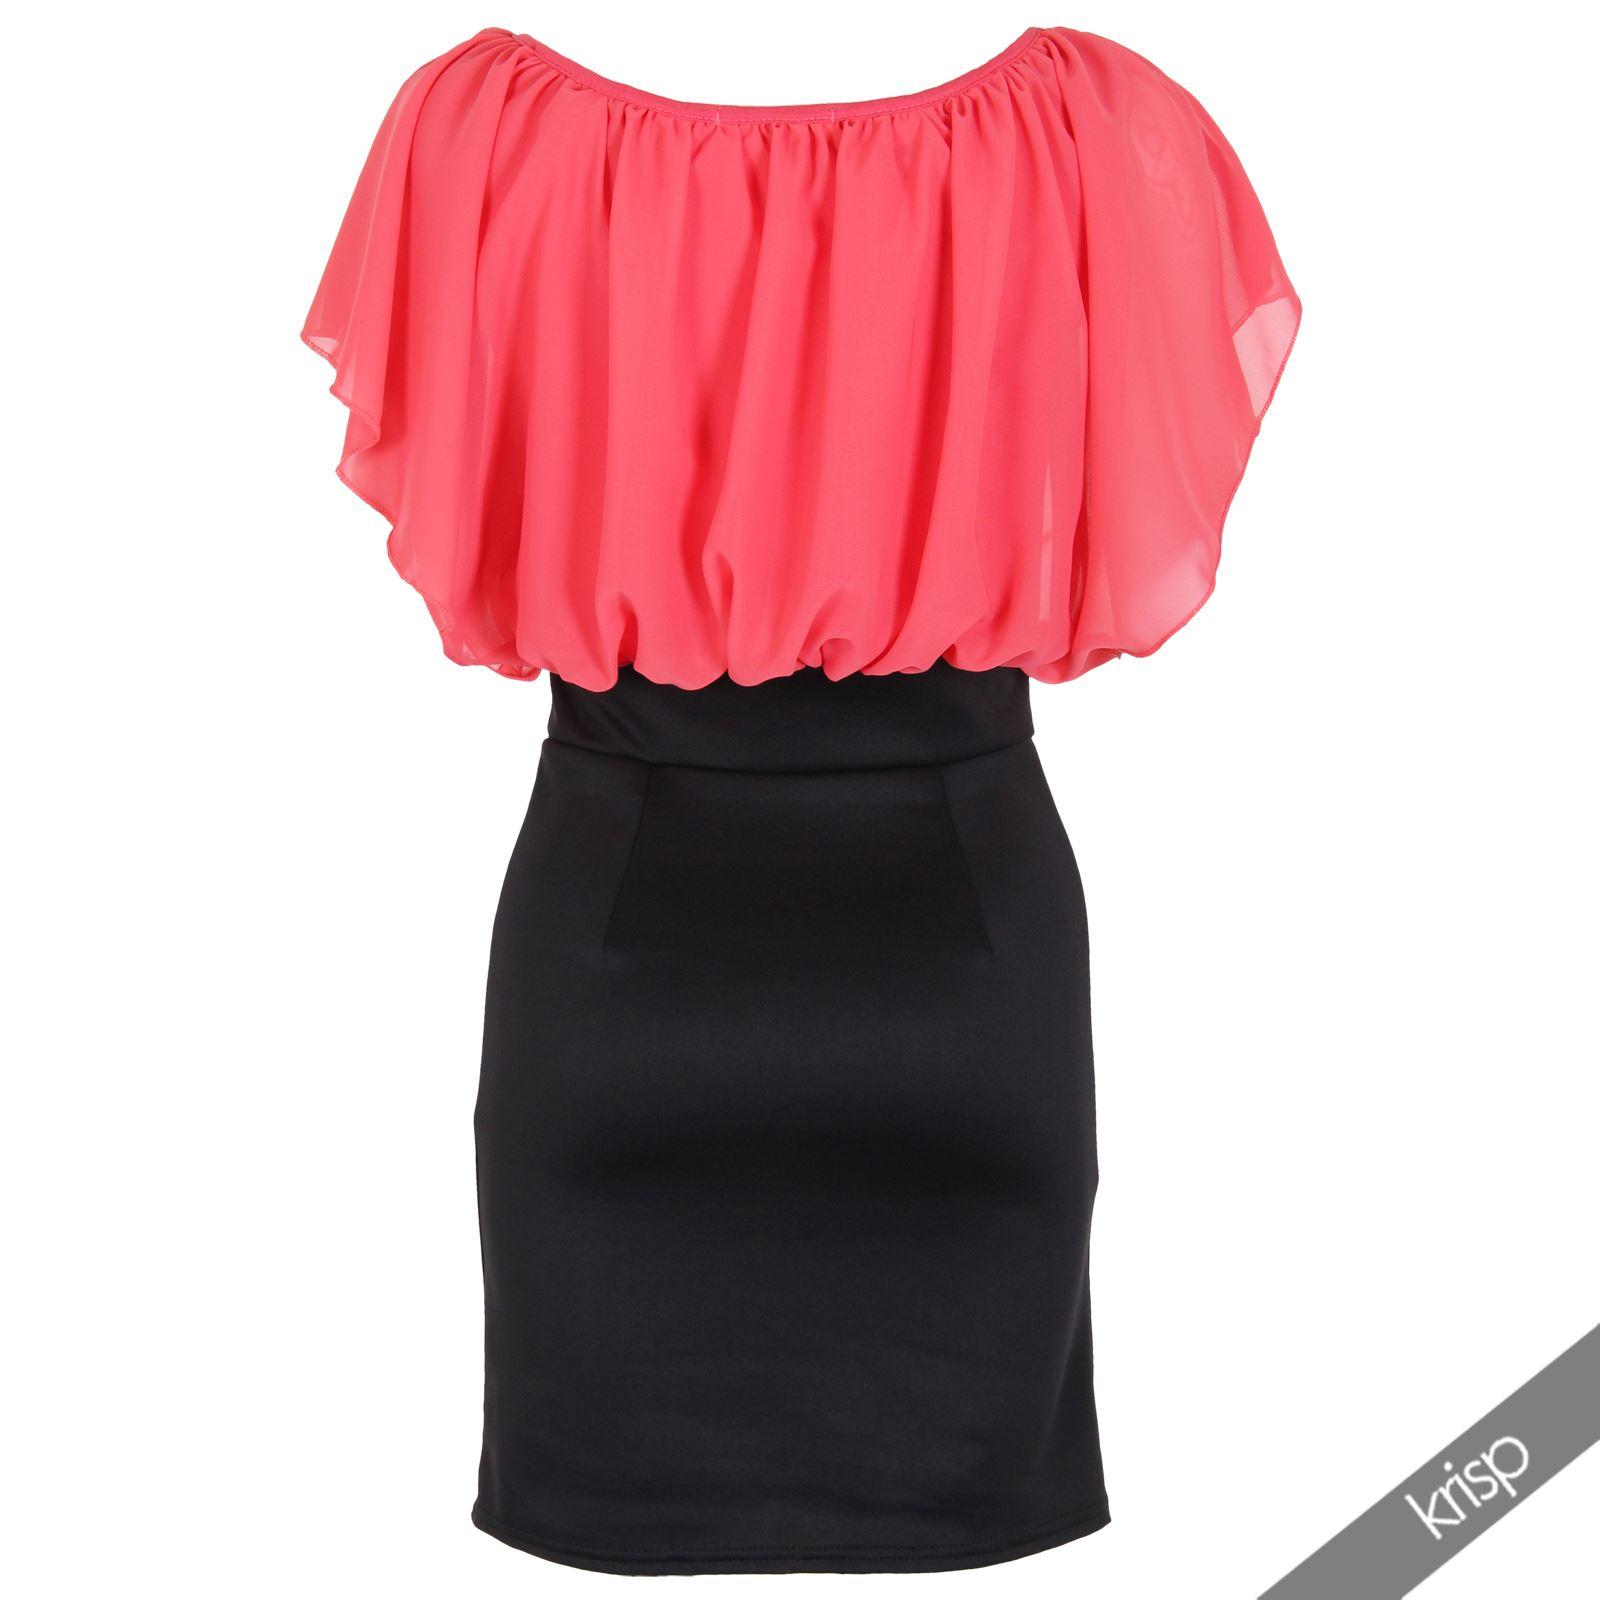 Womens-Pleated-Chiffon-Batwing-Top-High-Waist-Pencil-Bodycon-Skirt-Mini-Dress thumbnail 12